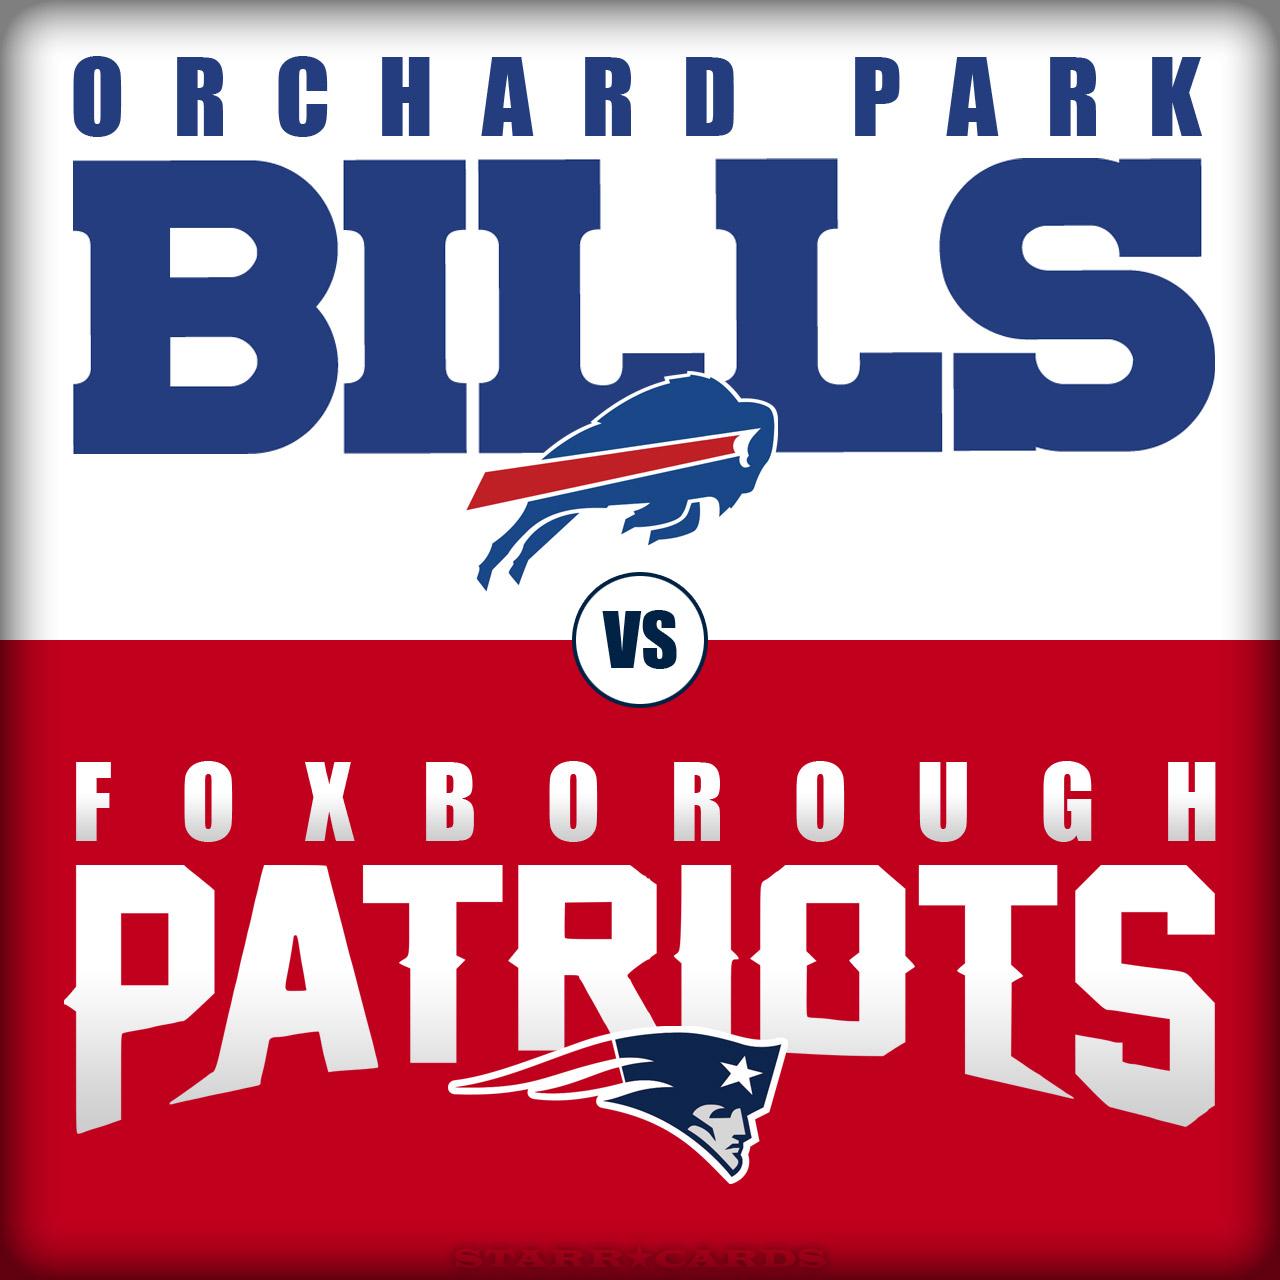 Buffalo Bills vs New England Patriots, or Orchard Park Bills vs Foxborough Patriots?